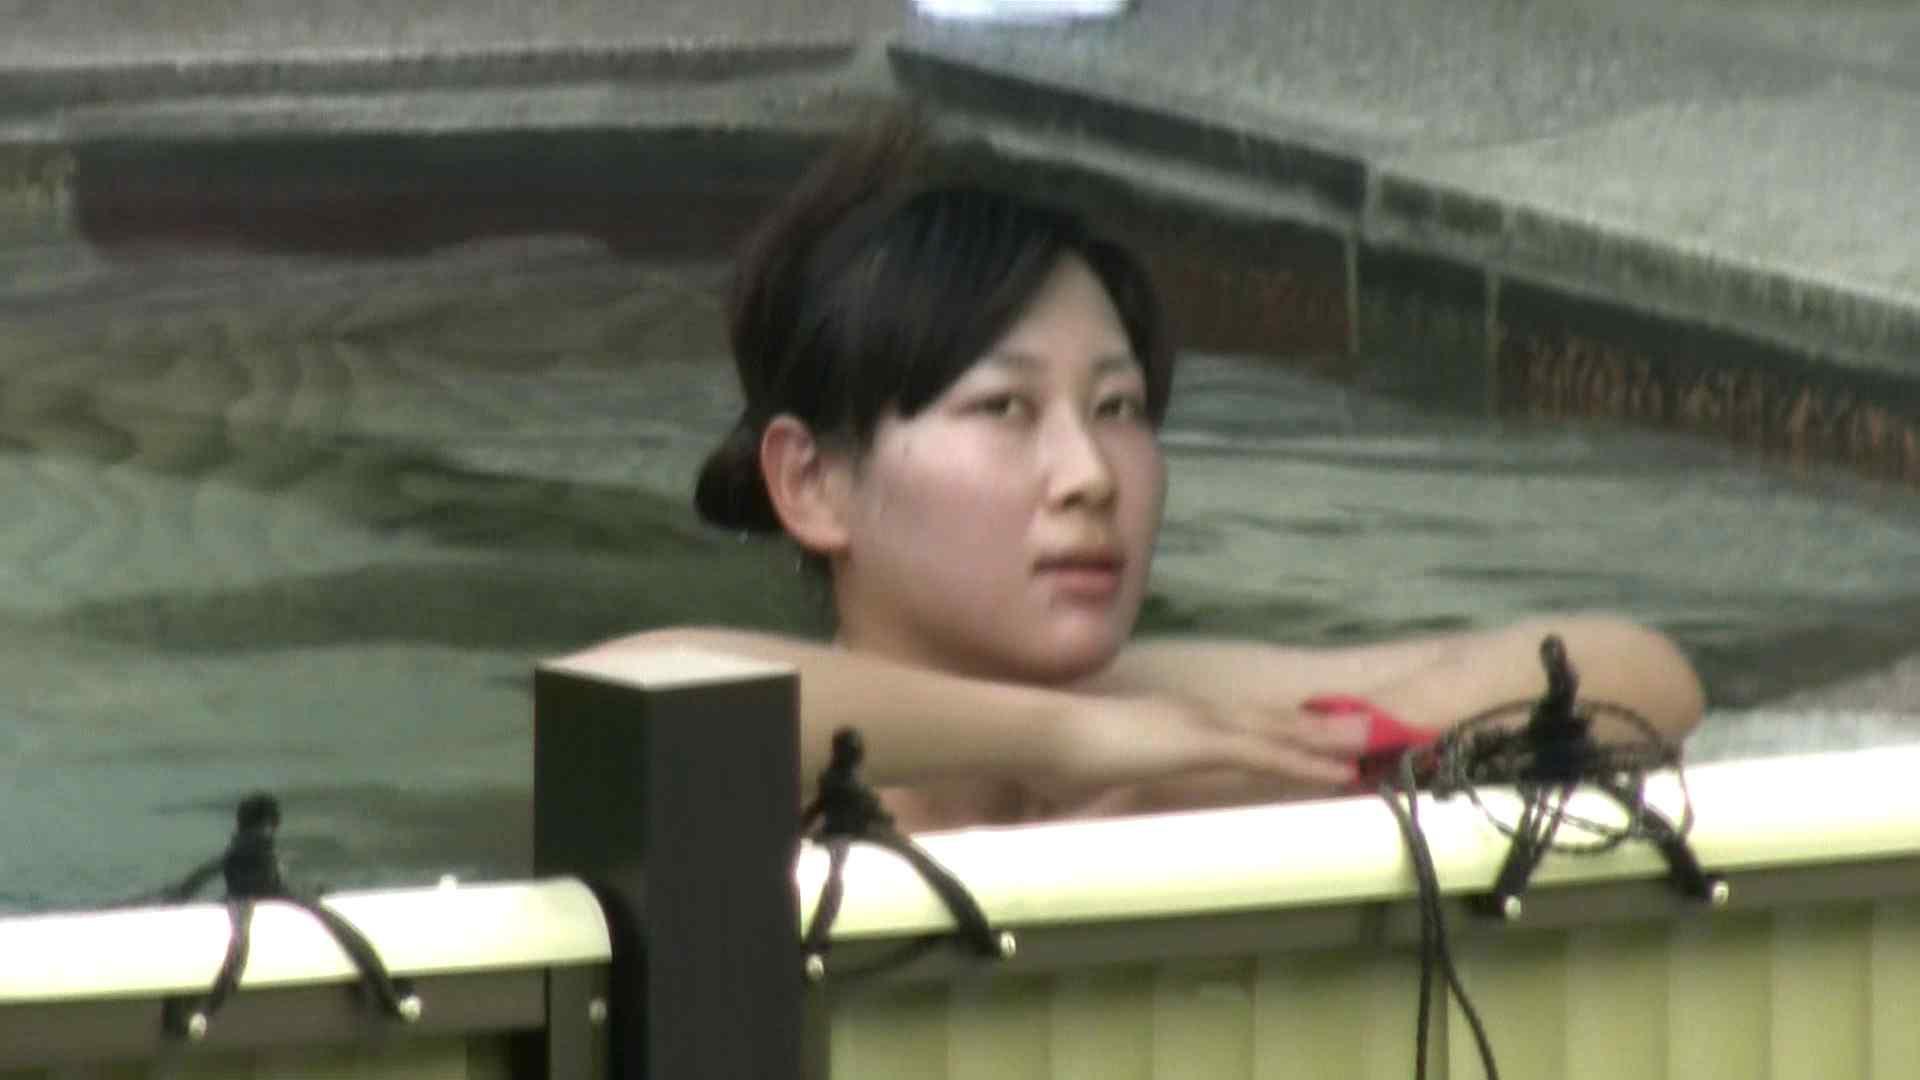 Aquaな露天風呂Vol.665 HなOL   盗撮  104pic 79